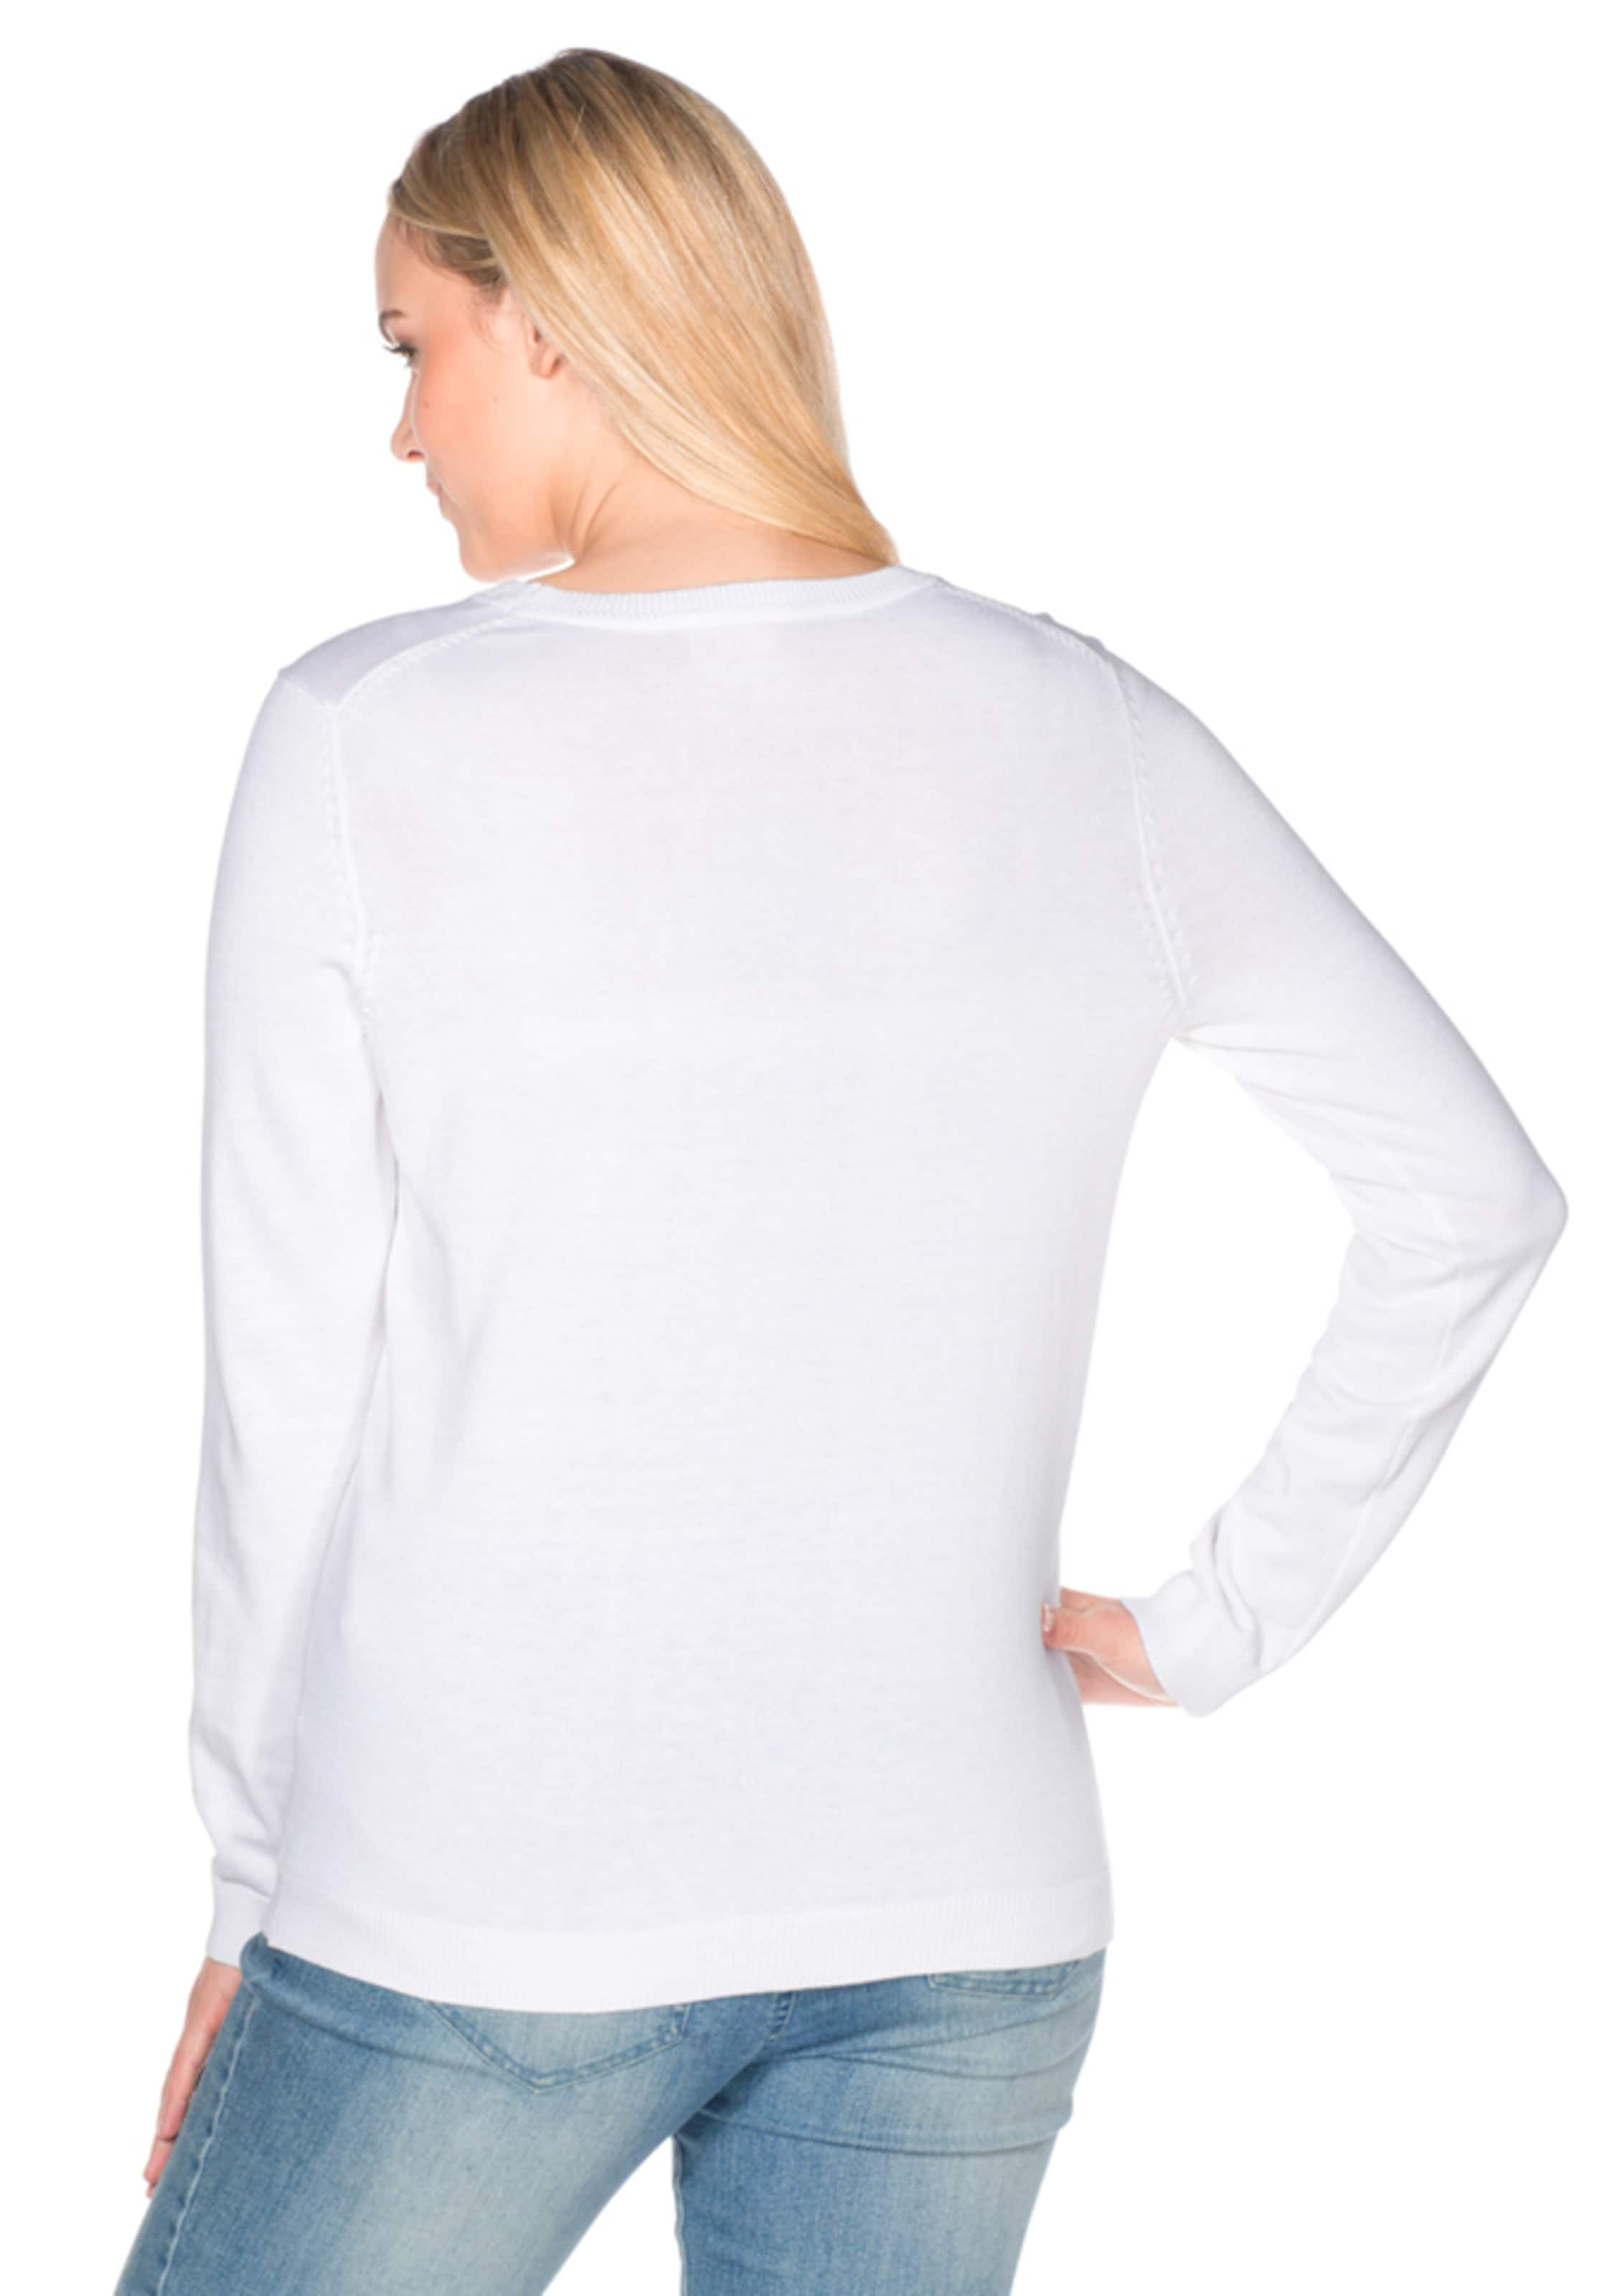 Original- Freies Verschiffen Wahl sheego casual Basic Pullover R1V8jEyvaC